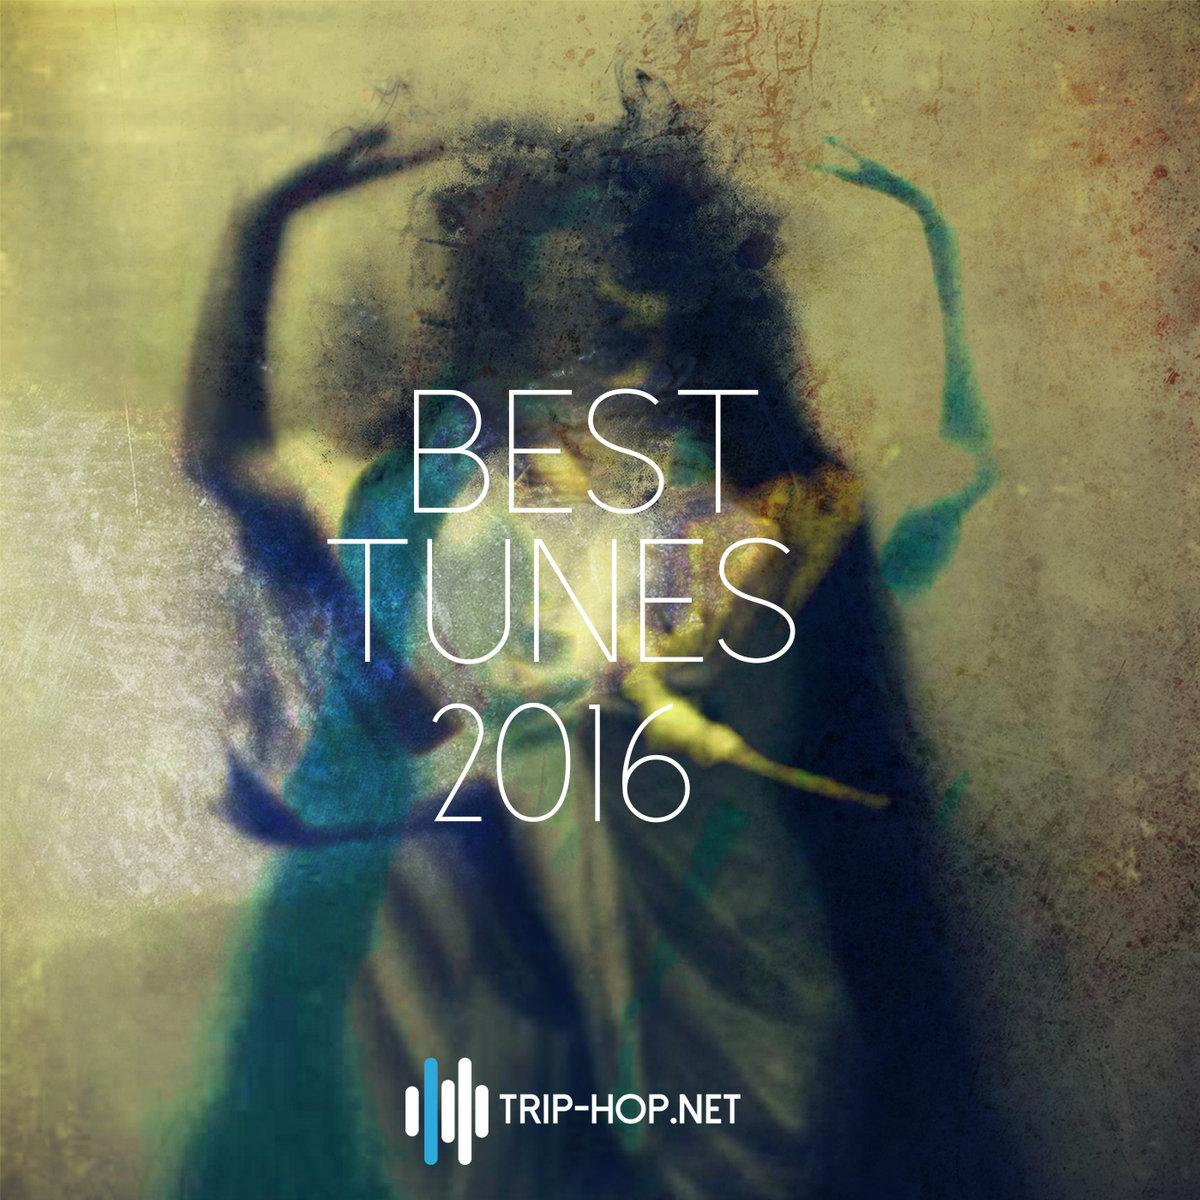 VA  (Trip-Hop.net) - Trip-Hop.net  Best Tunes 2016 (2017)